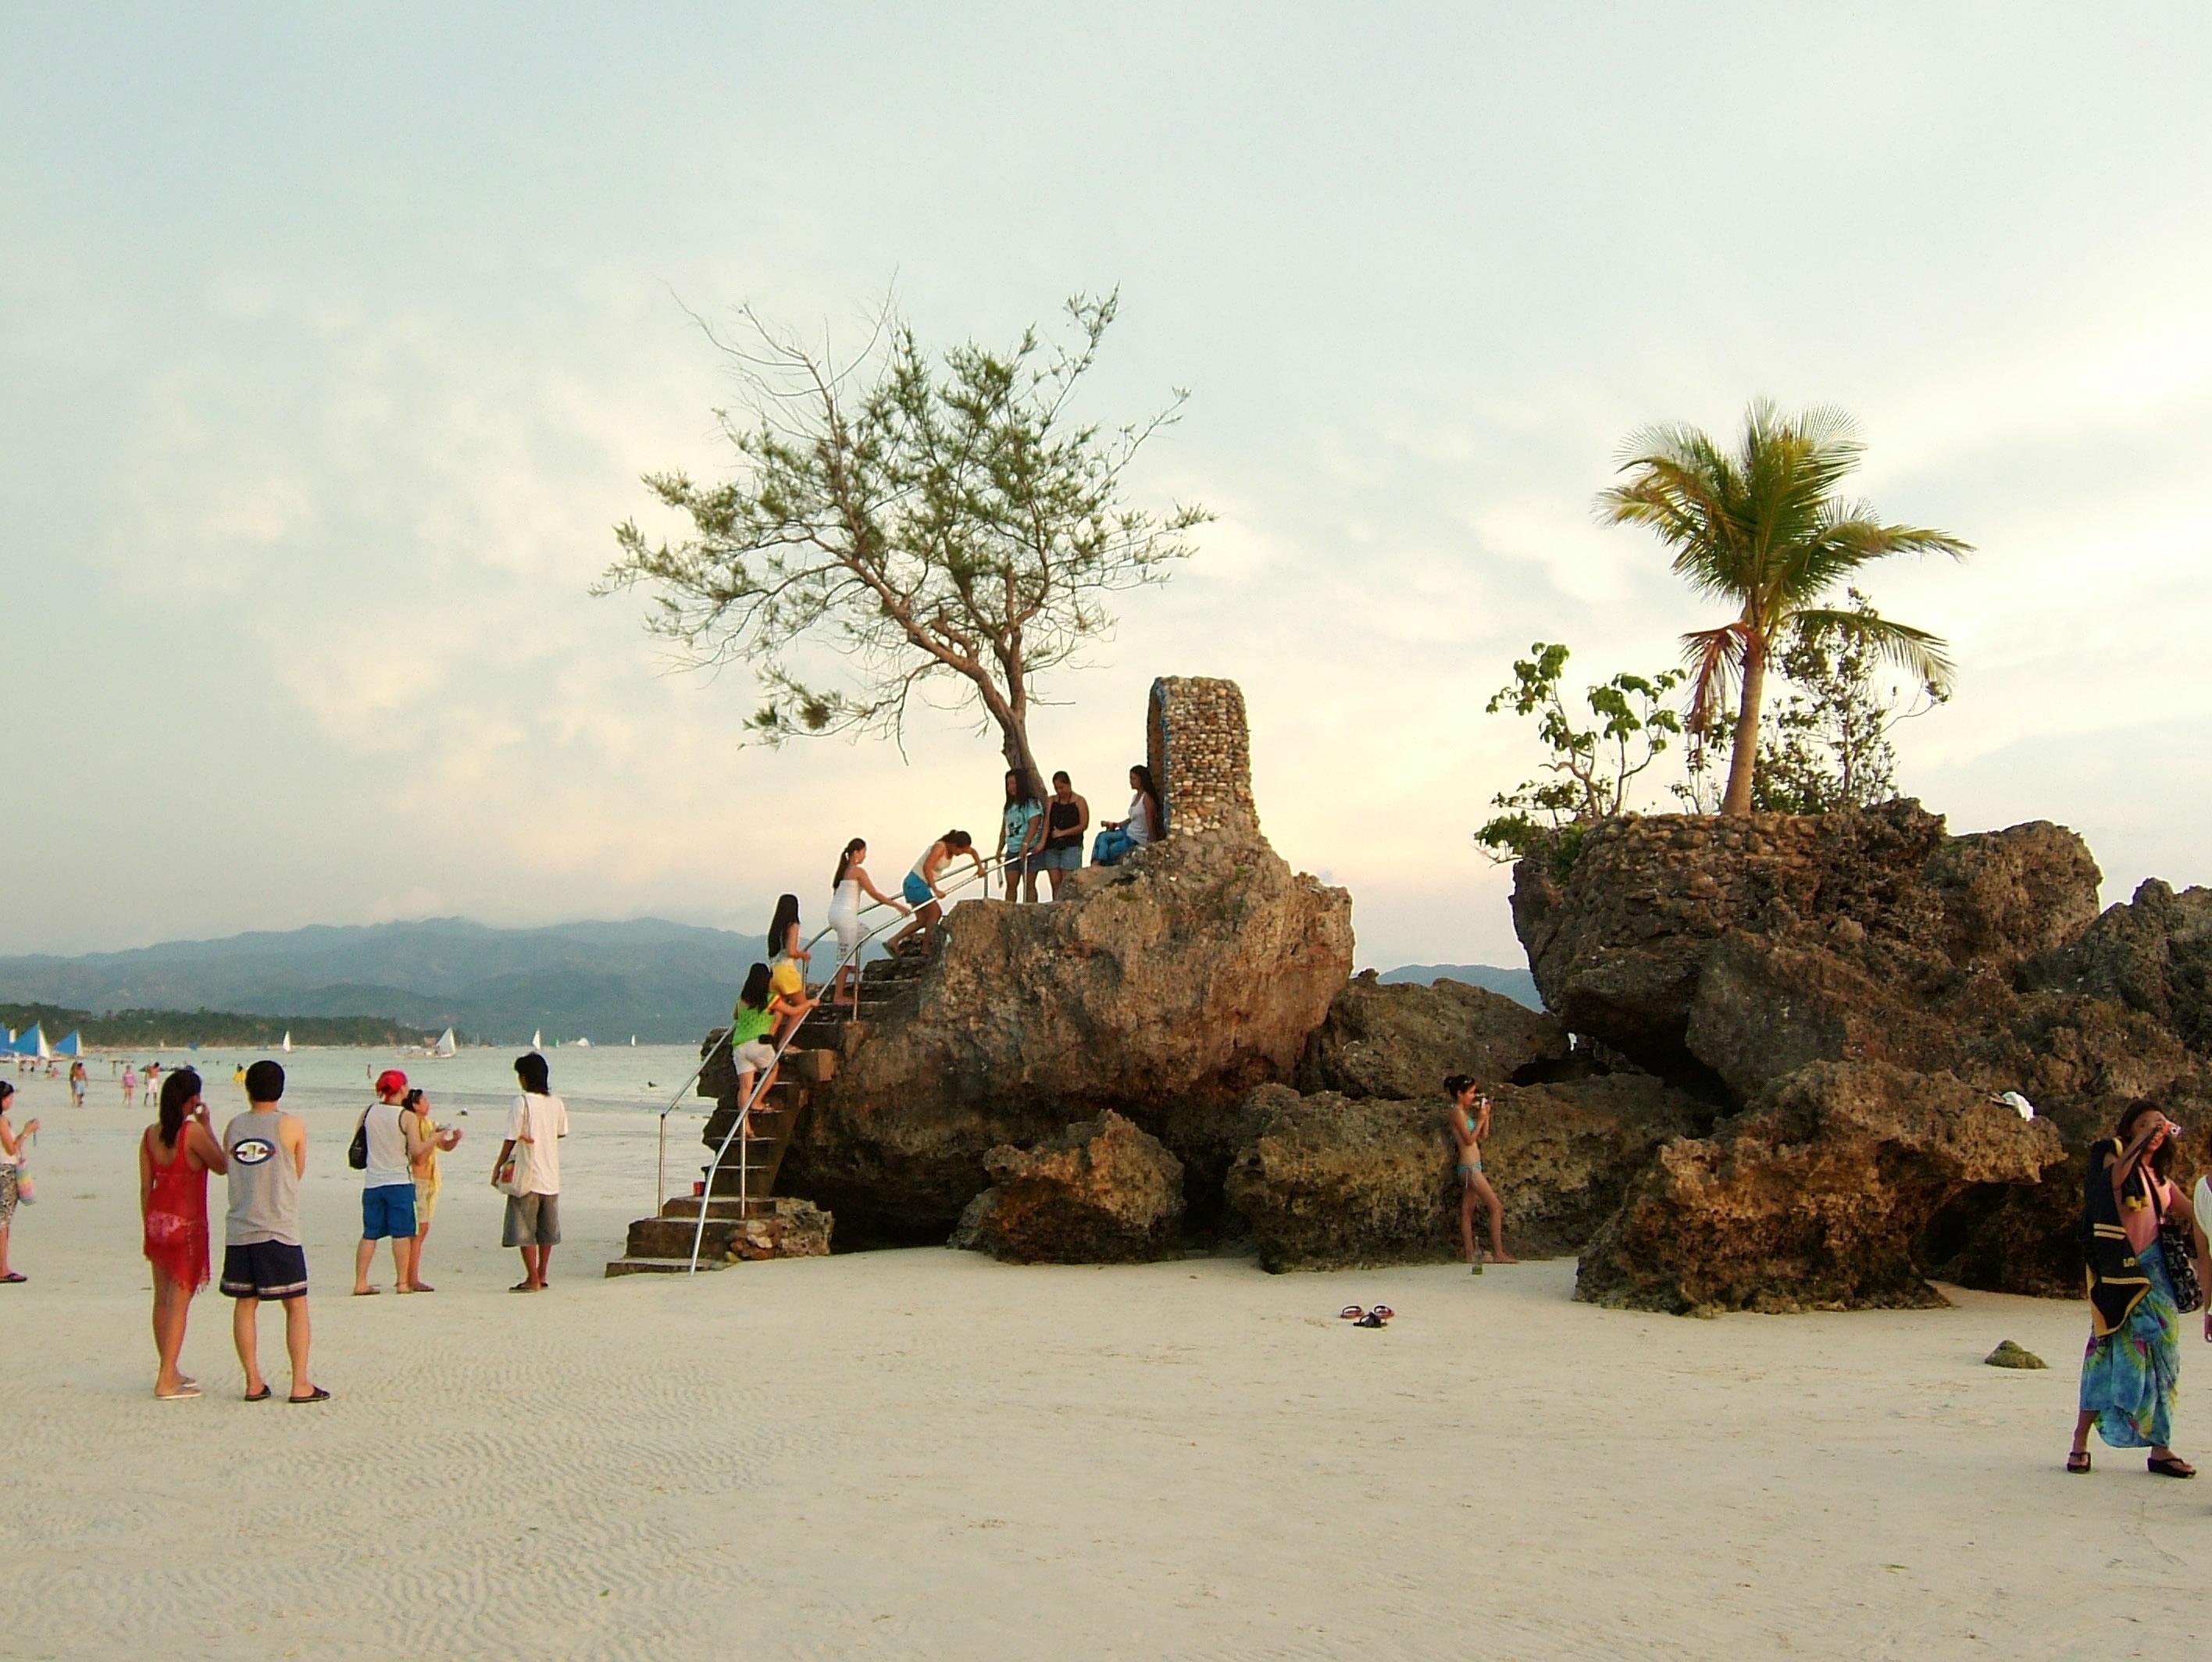 Philippines Sugar Islands Caticlan Boracay White Beach Sunset 2007 16